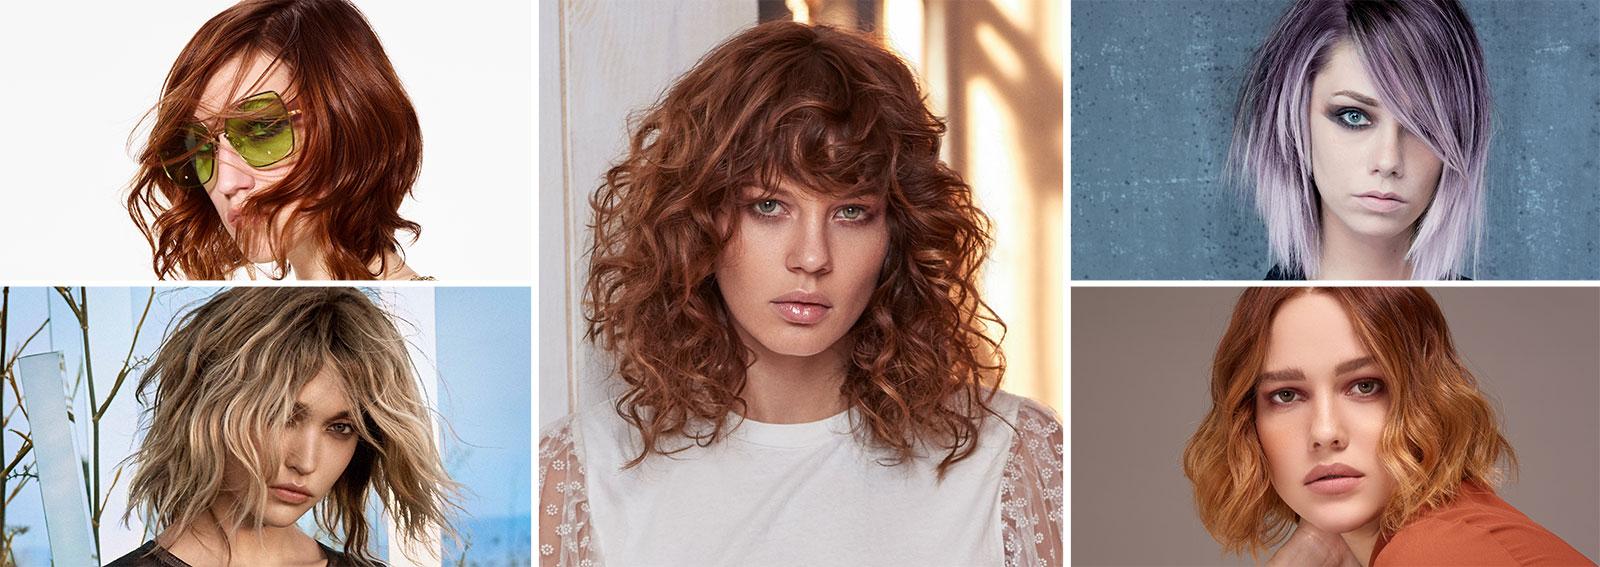 tagli-capelli-medi-saloni-primavera-estate-2019-desktop